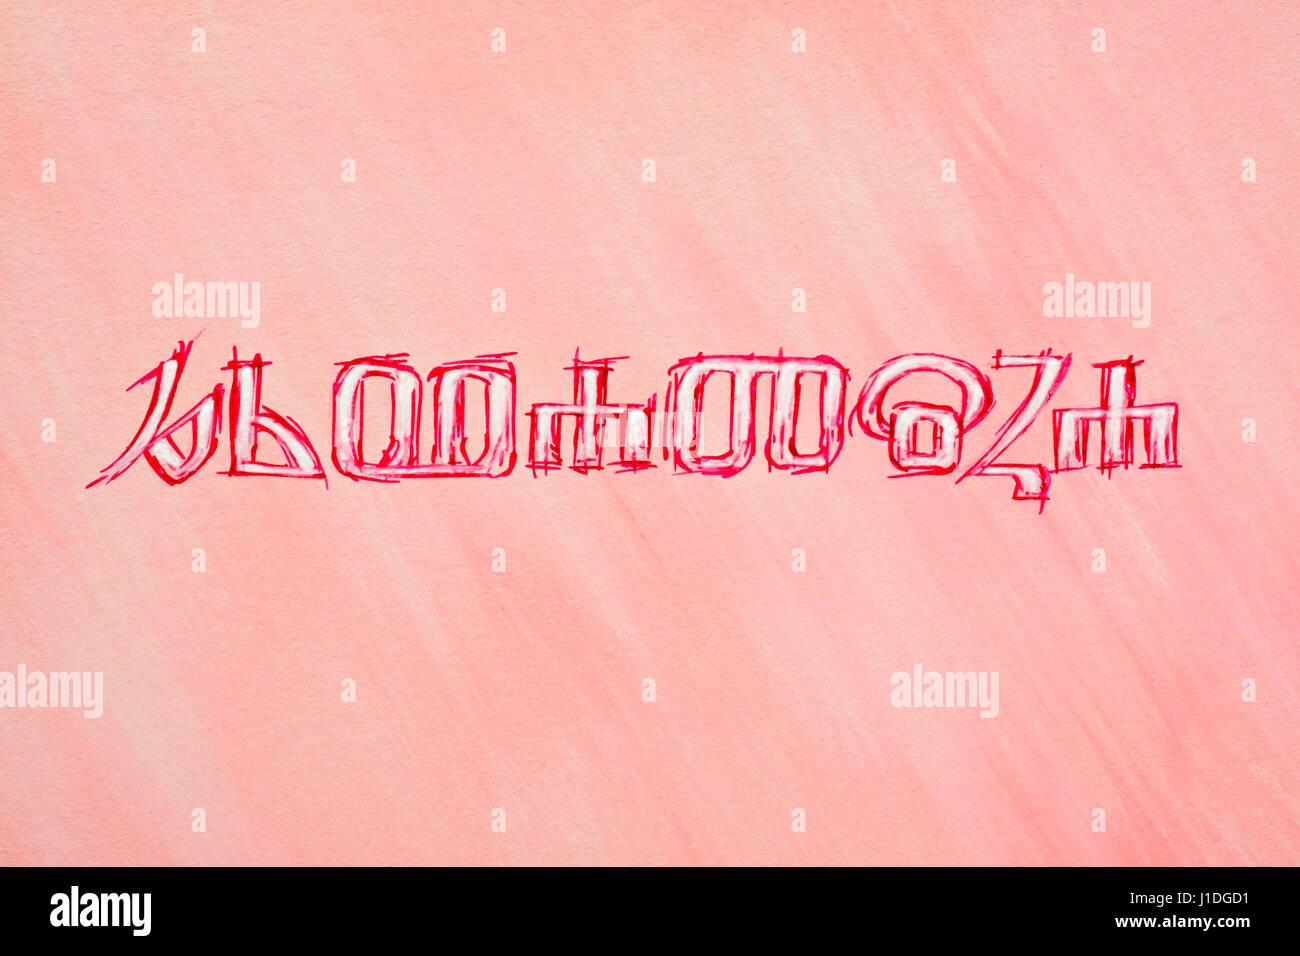 Country name in comics style. Croatia (Hrvatska). Glagolitic script. Croatian language. - Stock Image